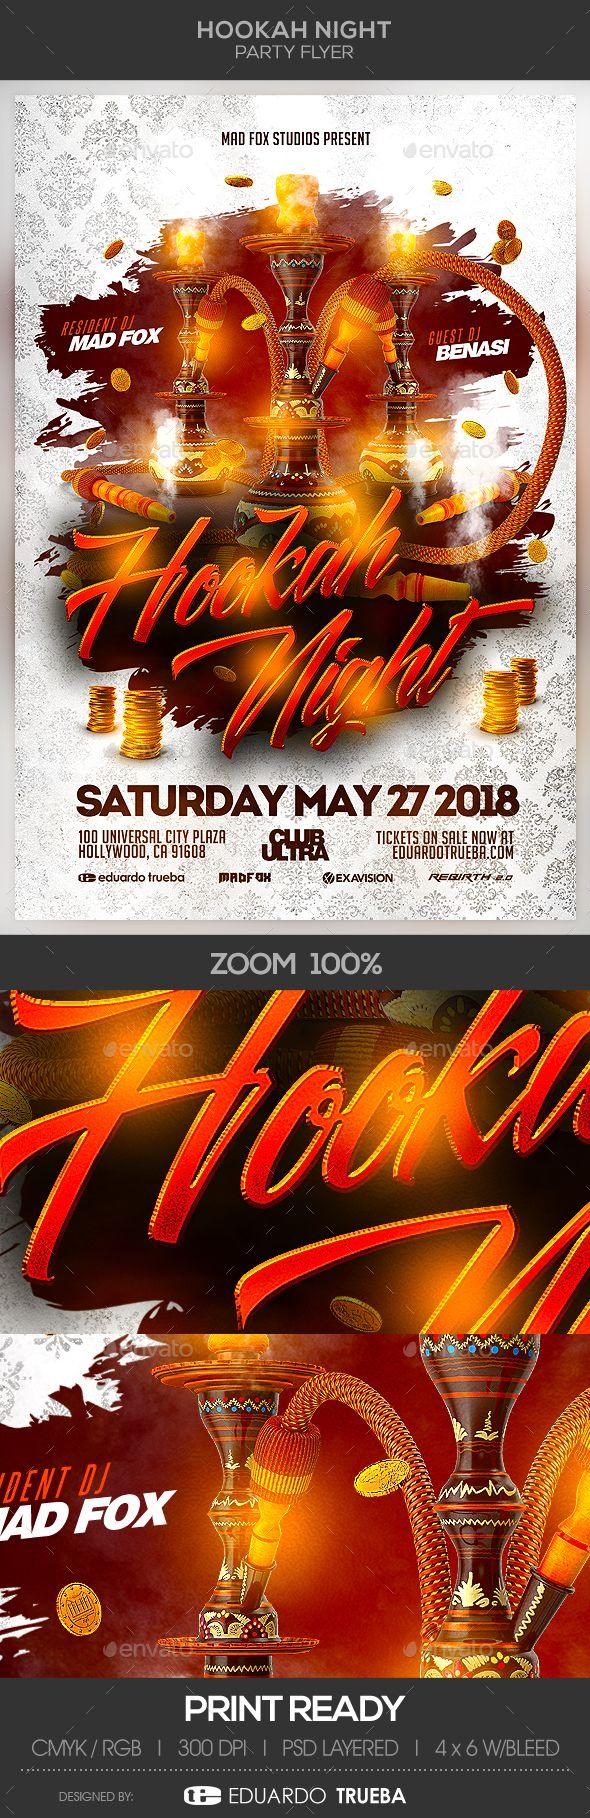 hookah night party flyer pinterest party flyer night parties